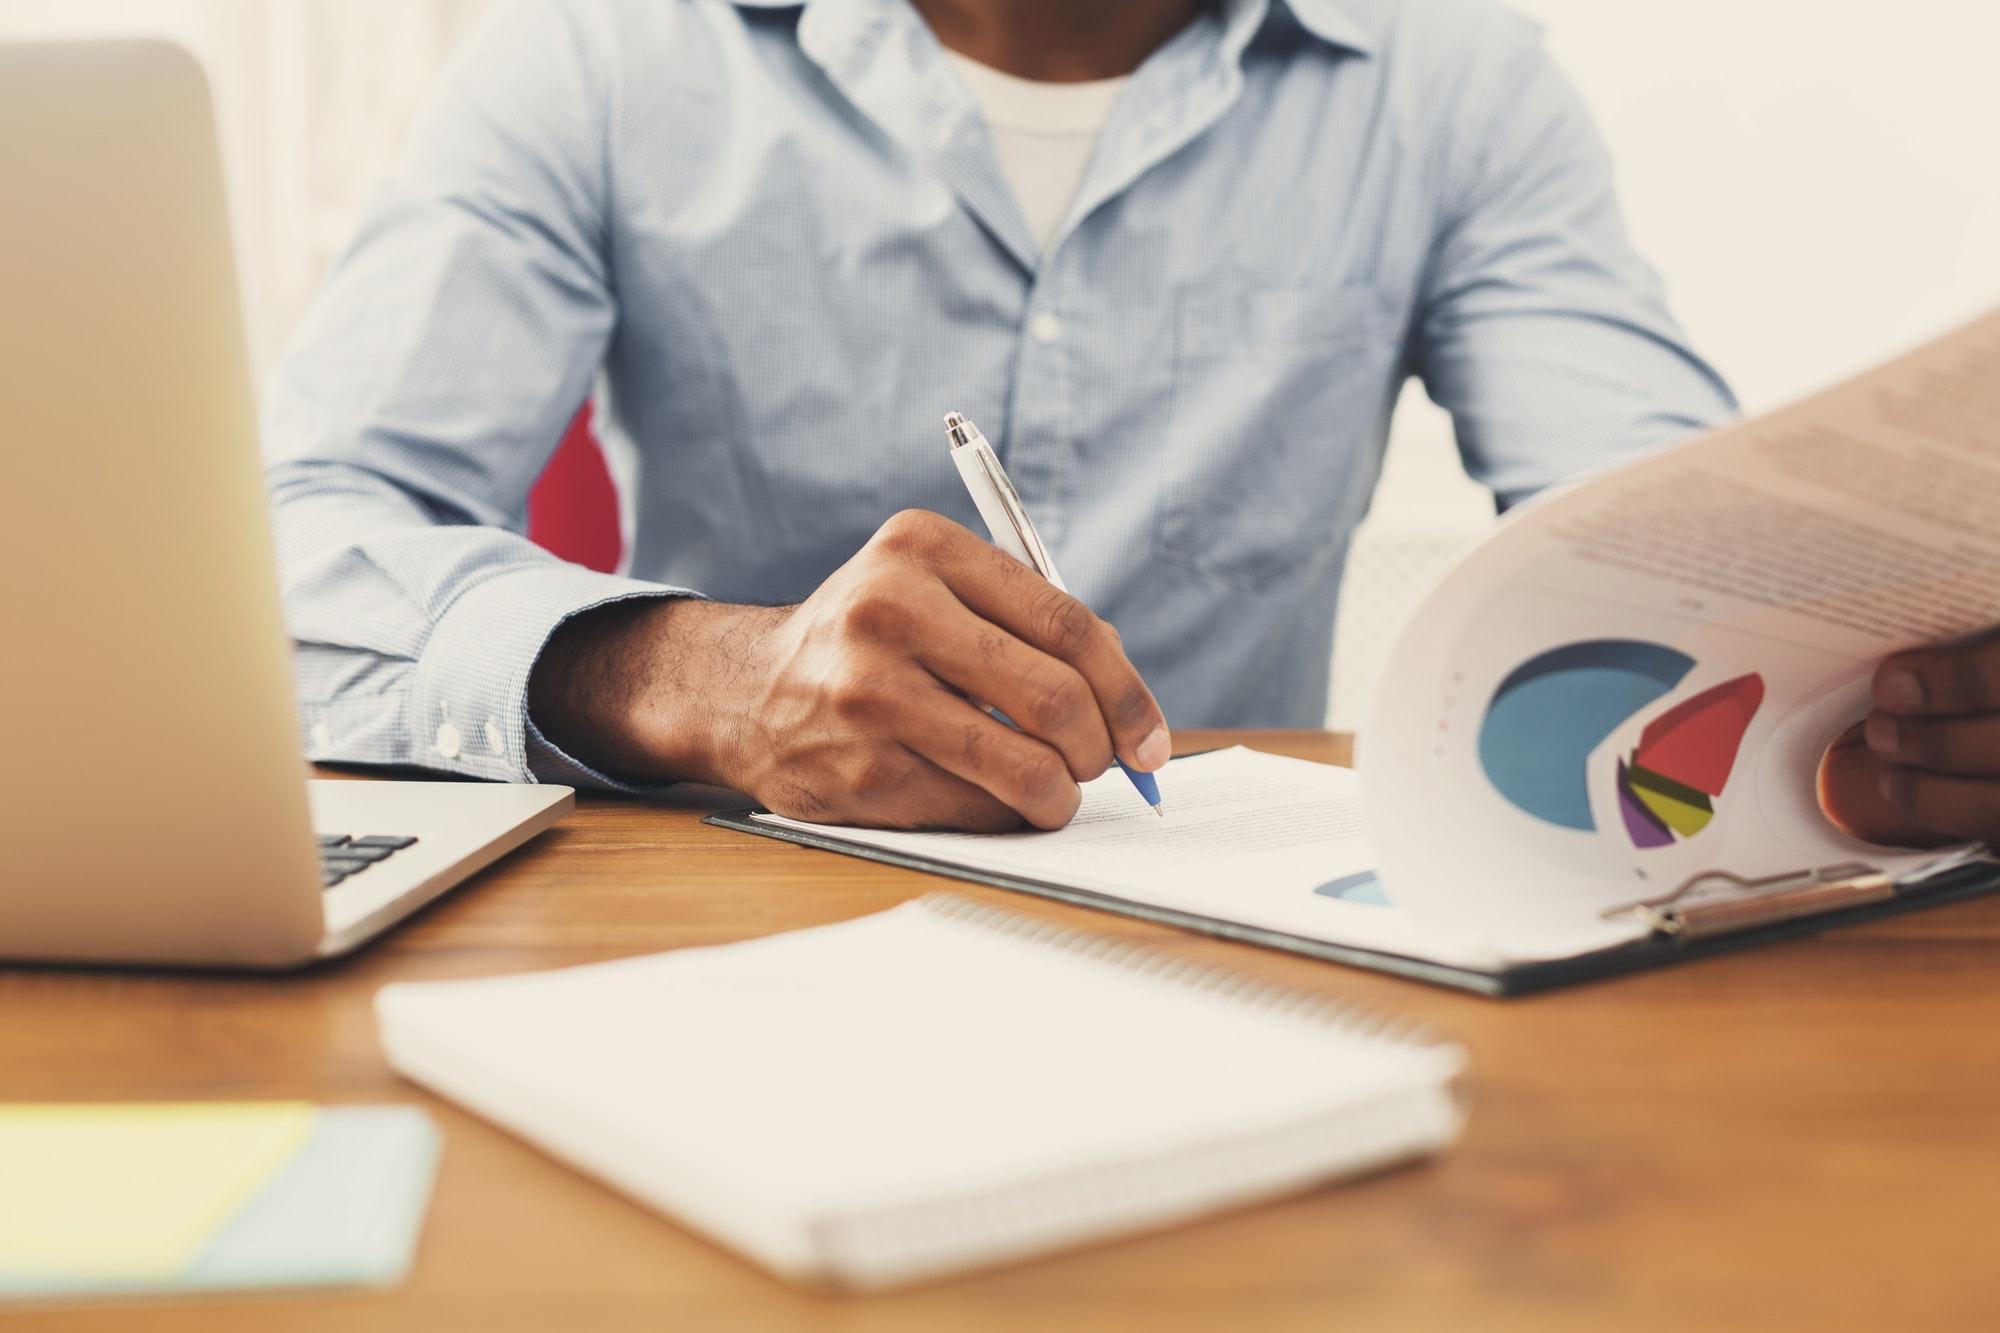 Black man reading documents in modern office